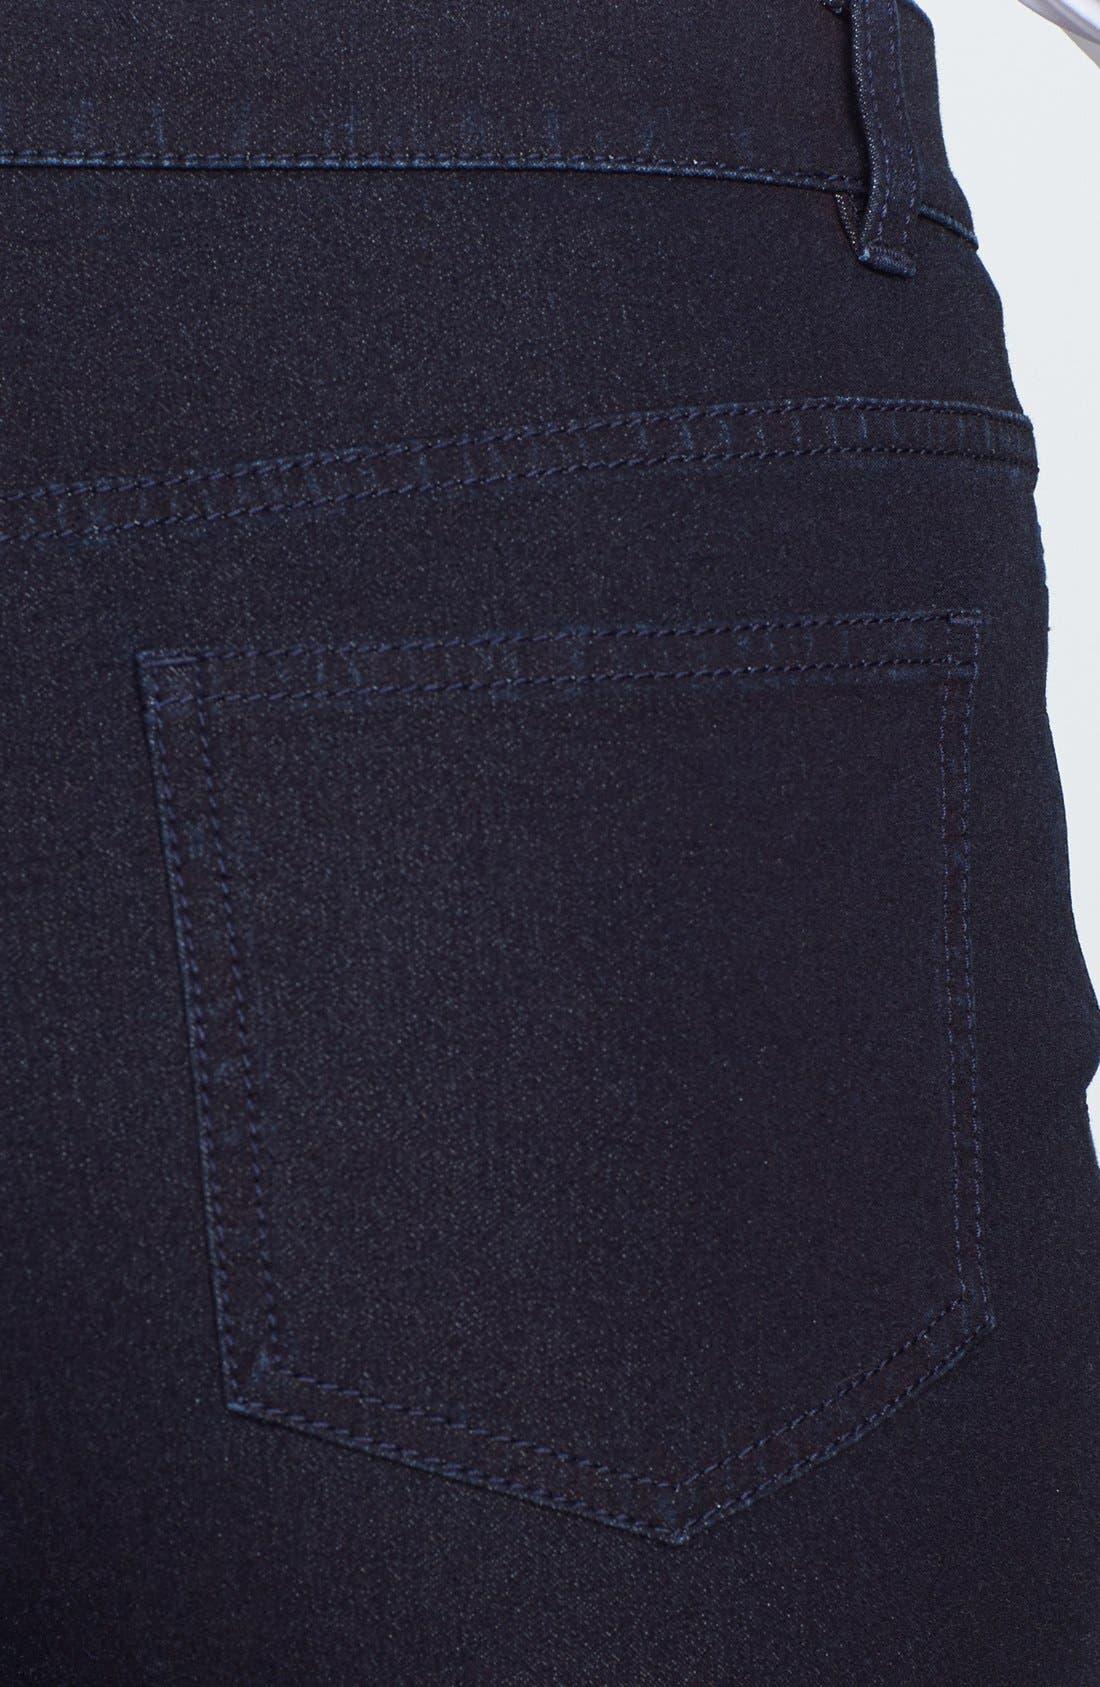 Alternate Image 3  - Lafayette 148 New York Slim Leg Curvy Stretch Jeans